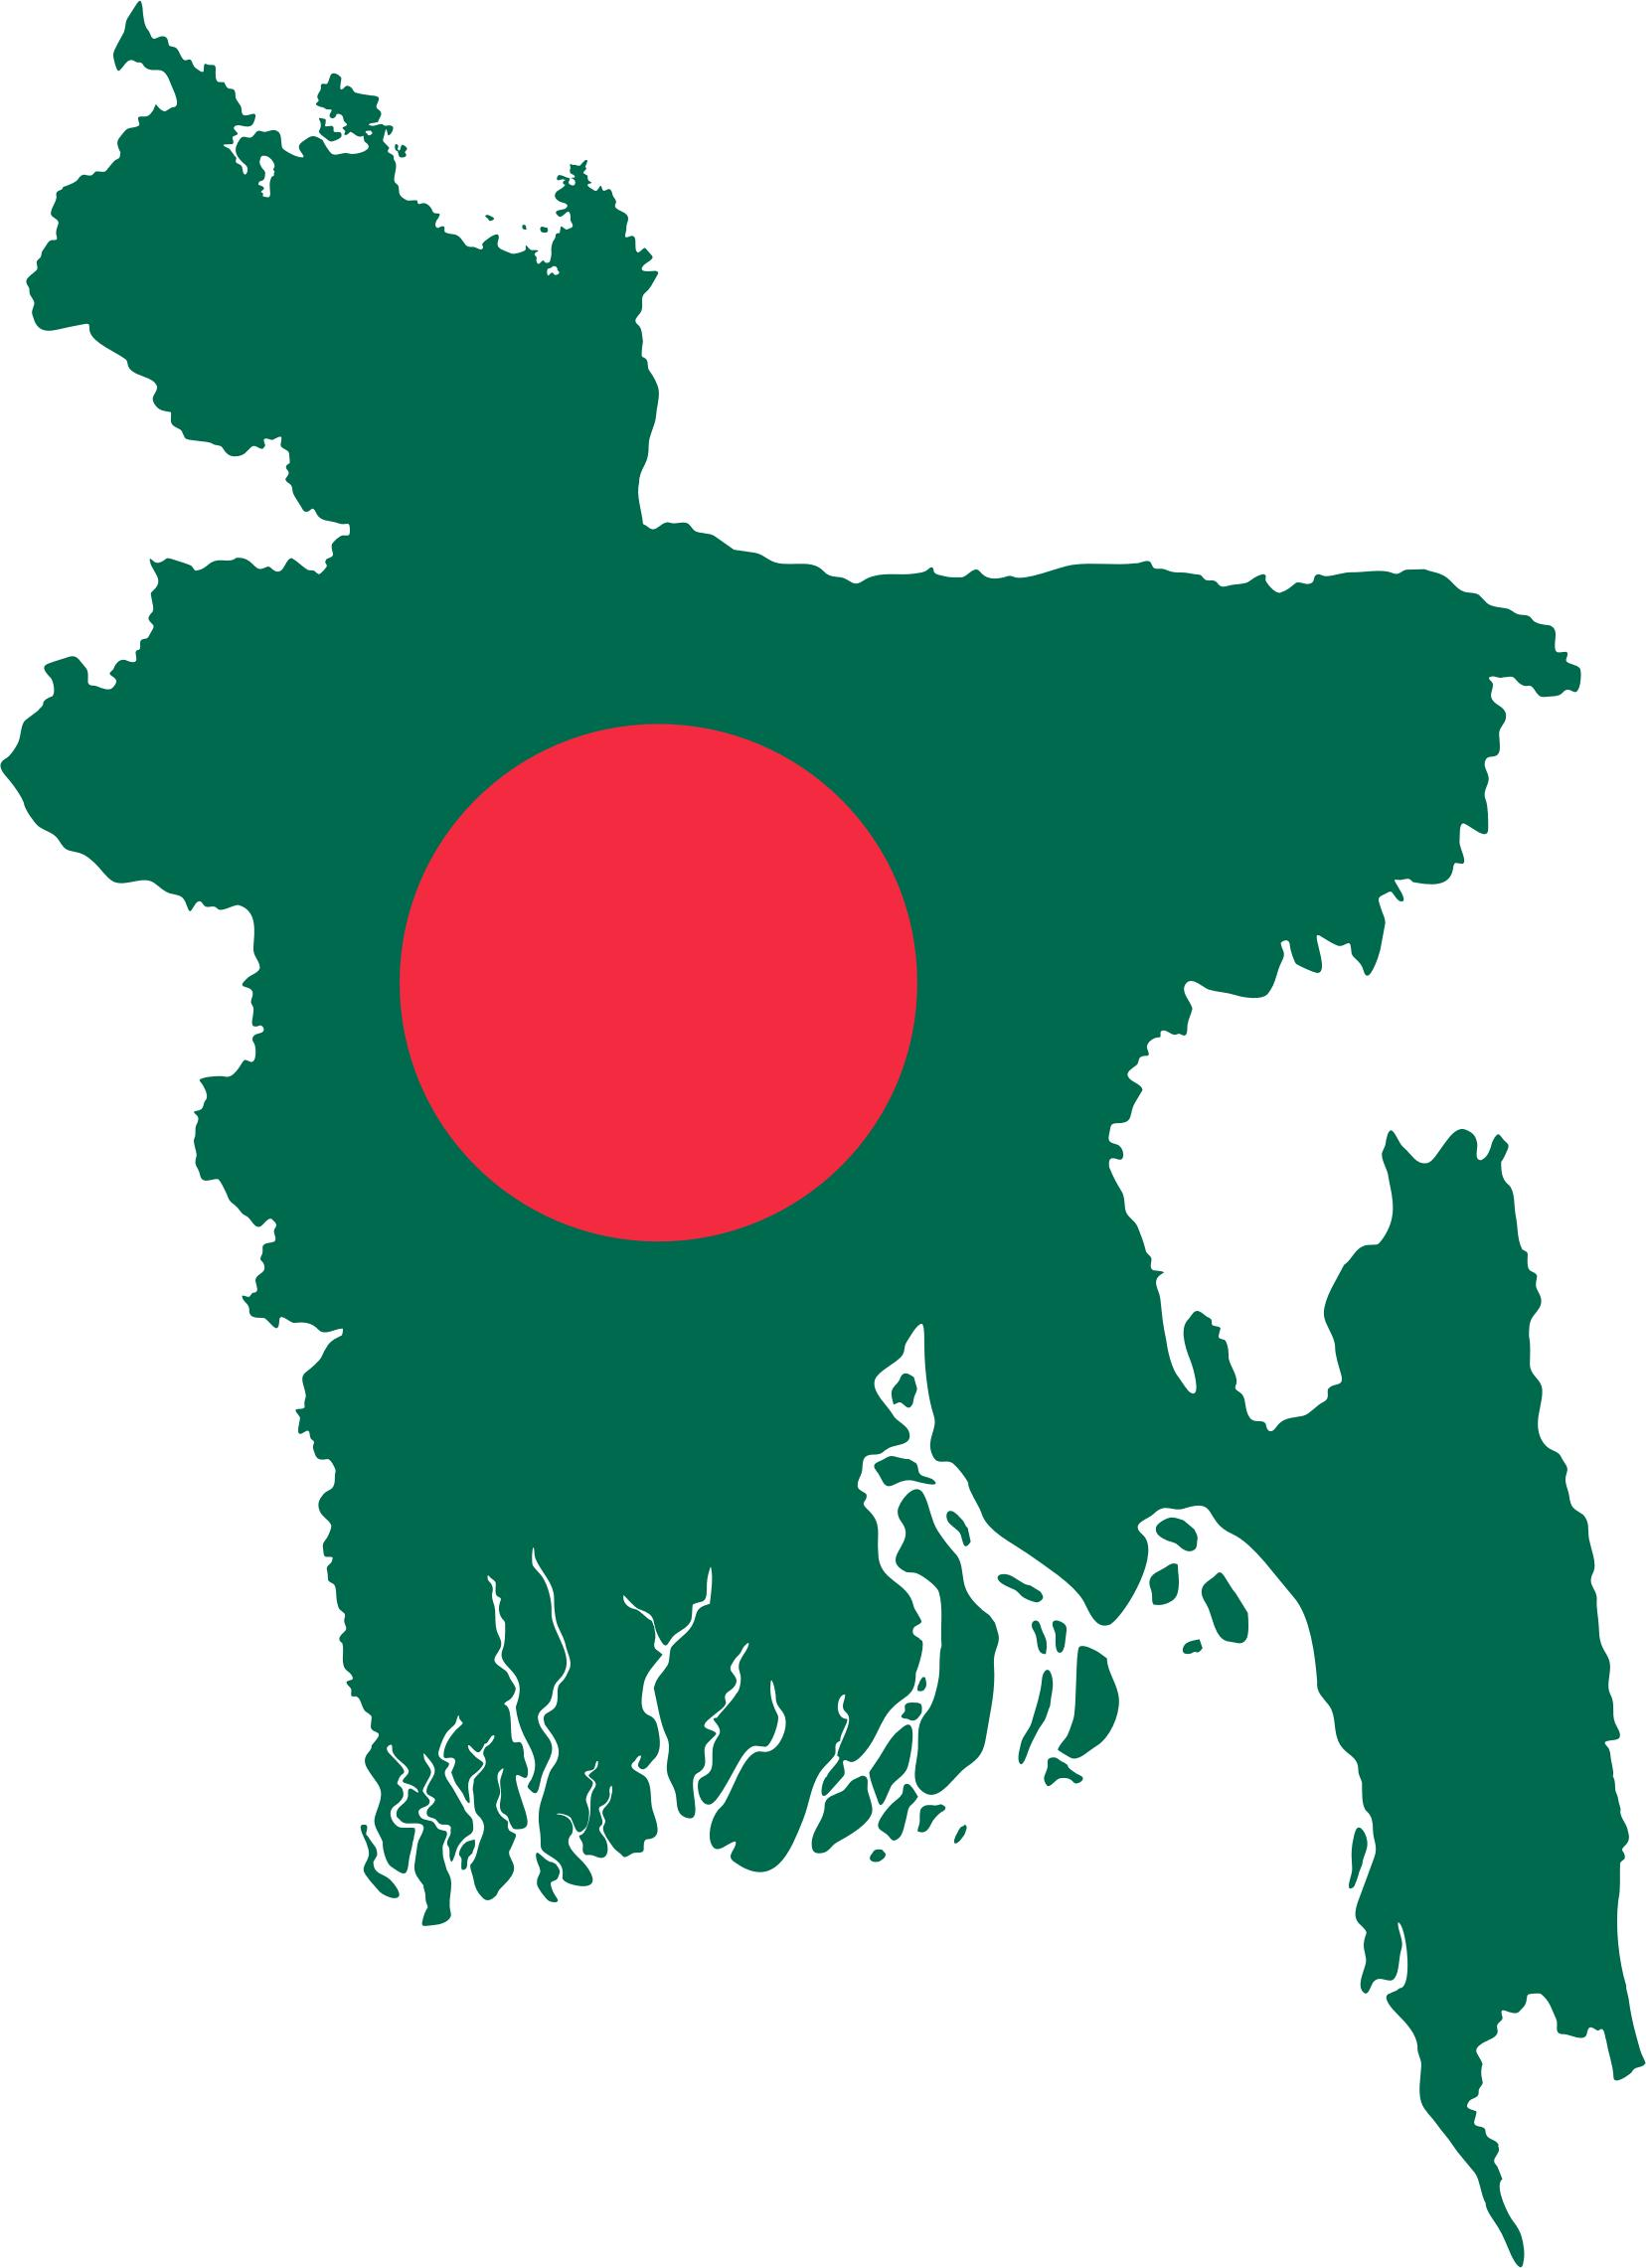 Bangladesh Map image